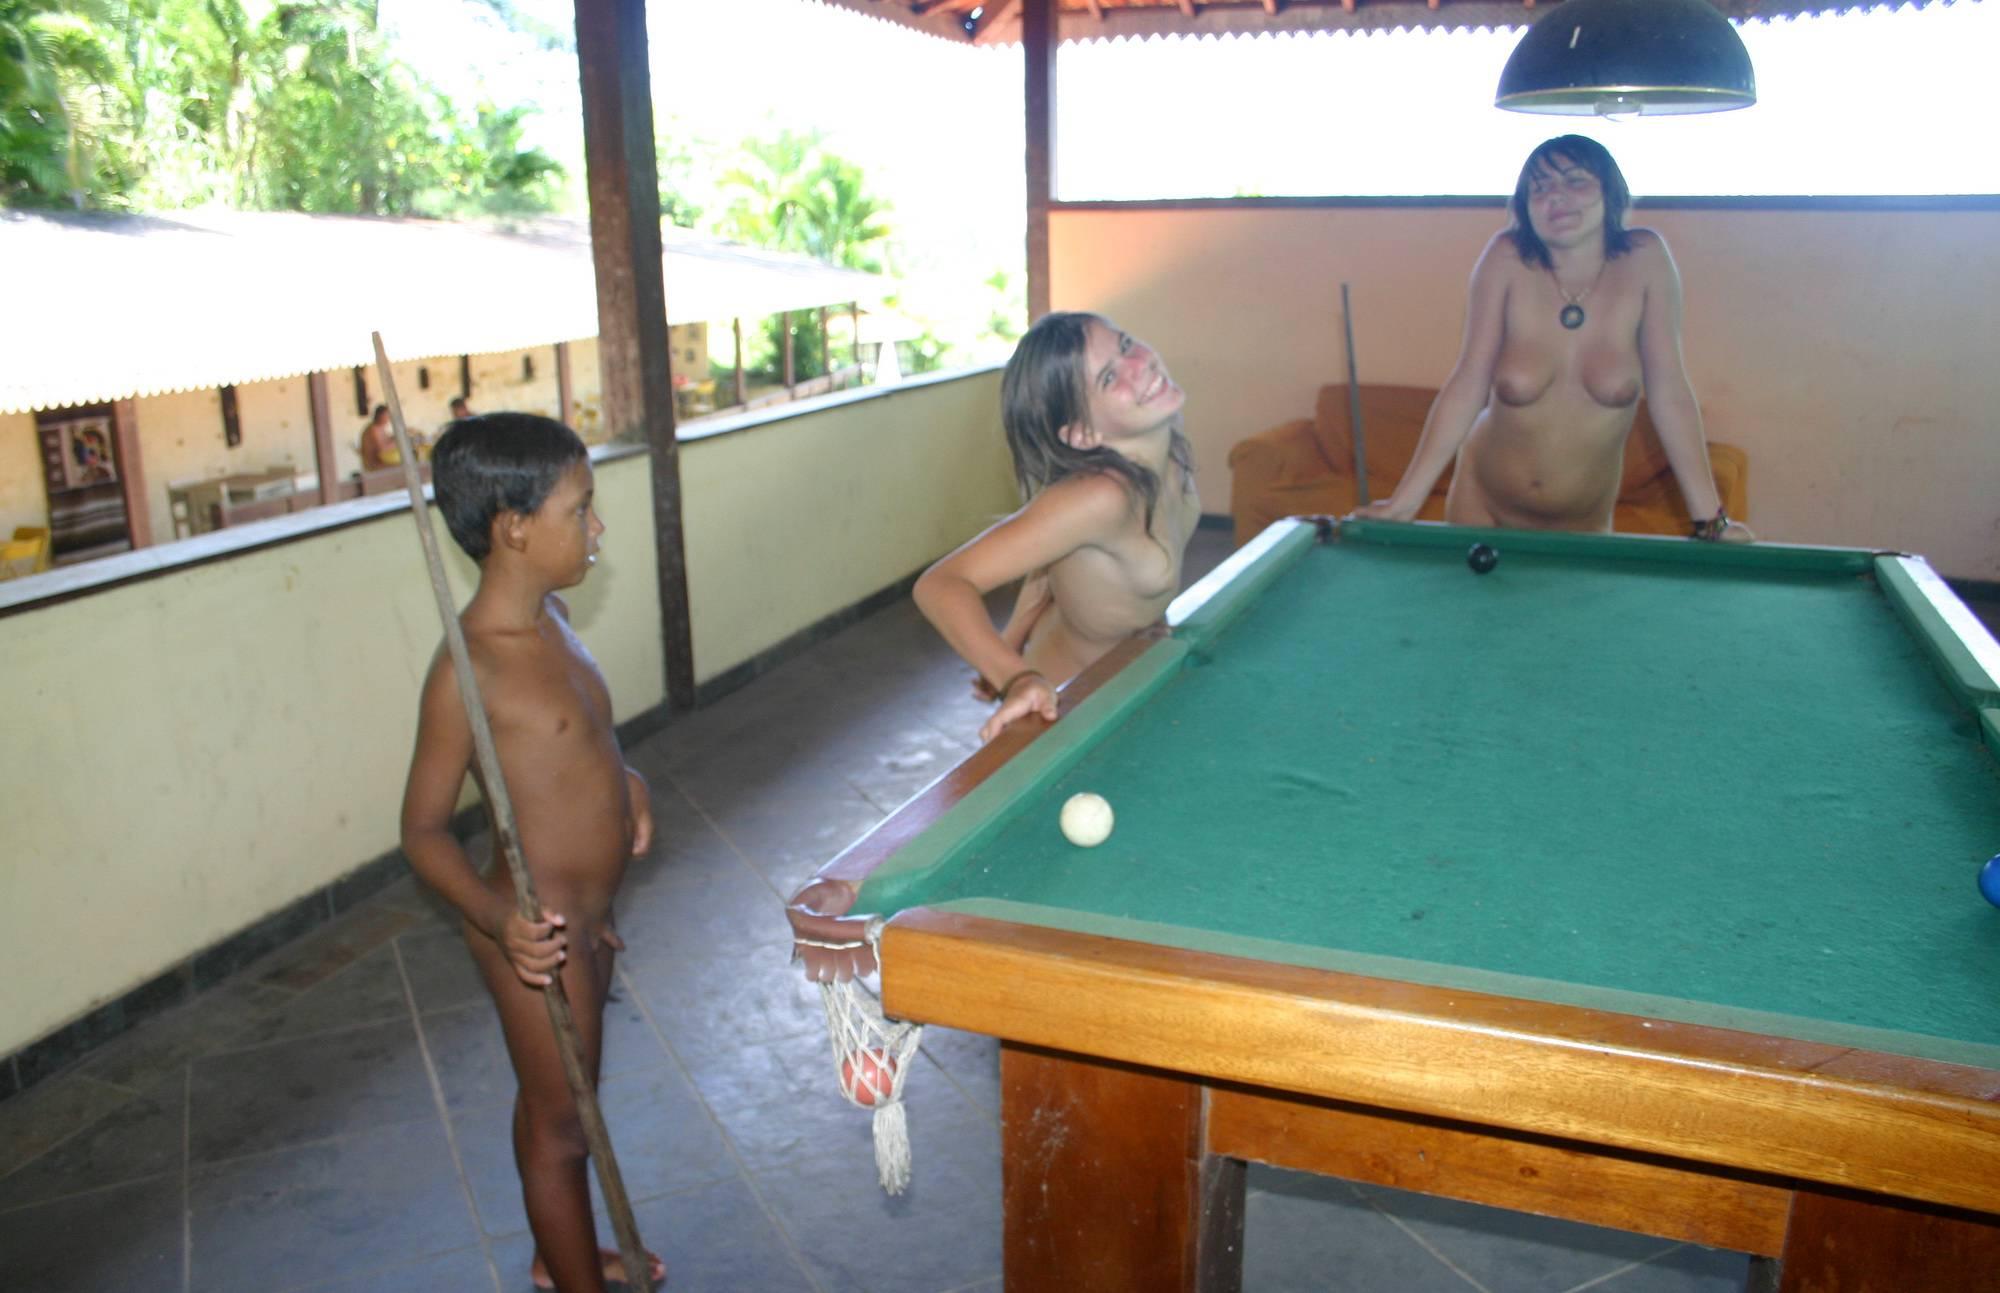 Brazilian Pool and Games - 2